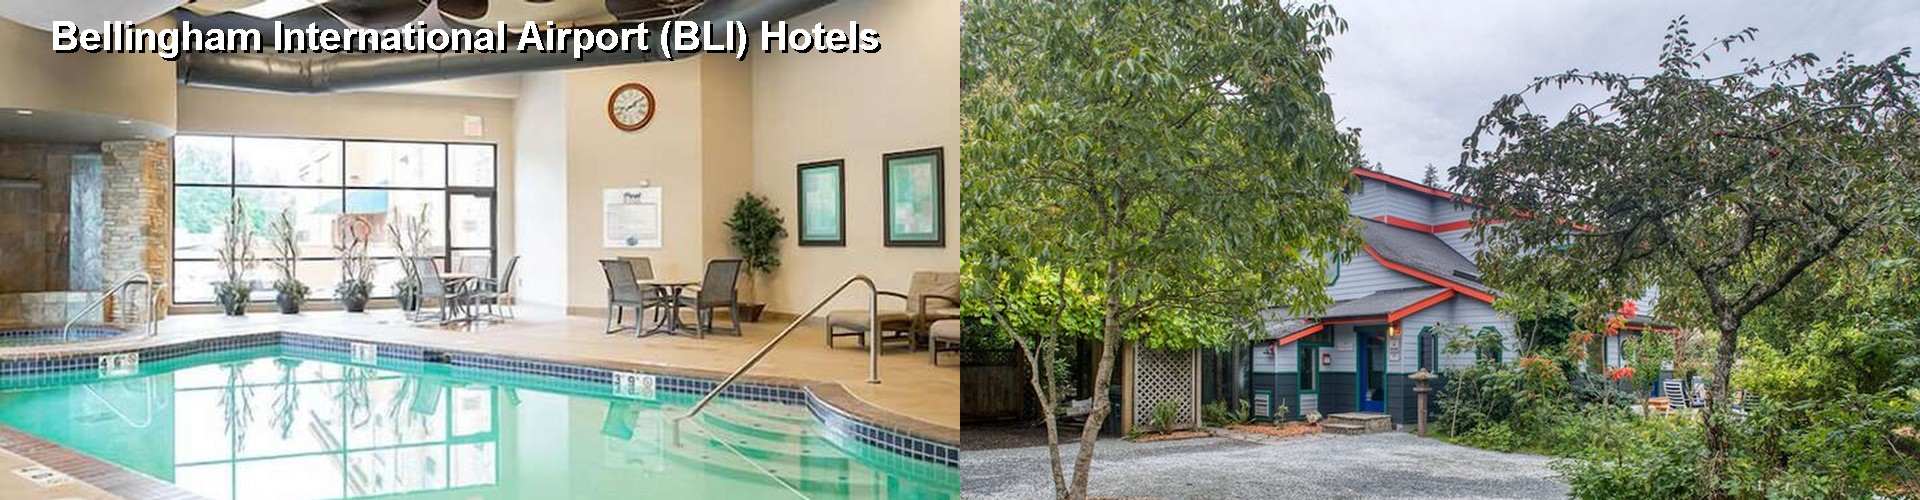 5 Best Hotels Near Bellingham International Airport Bli